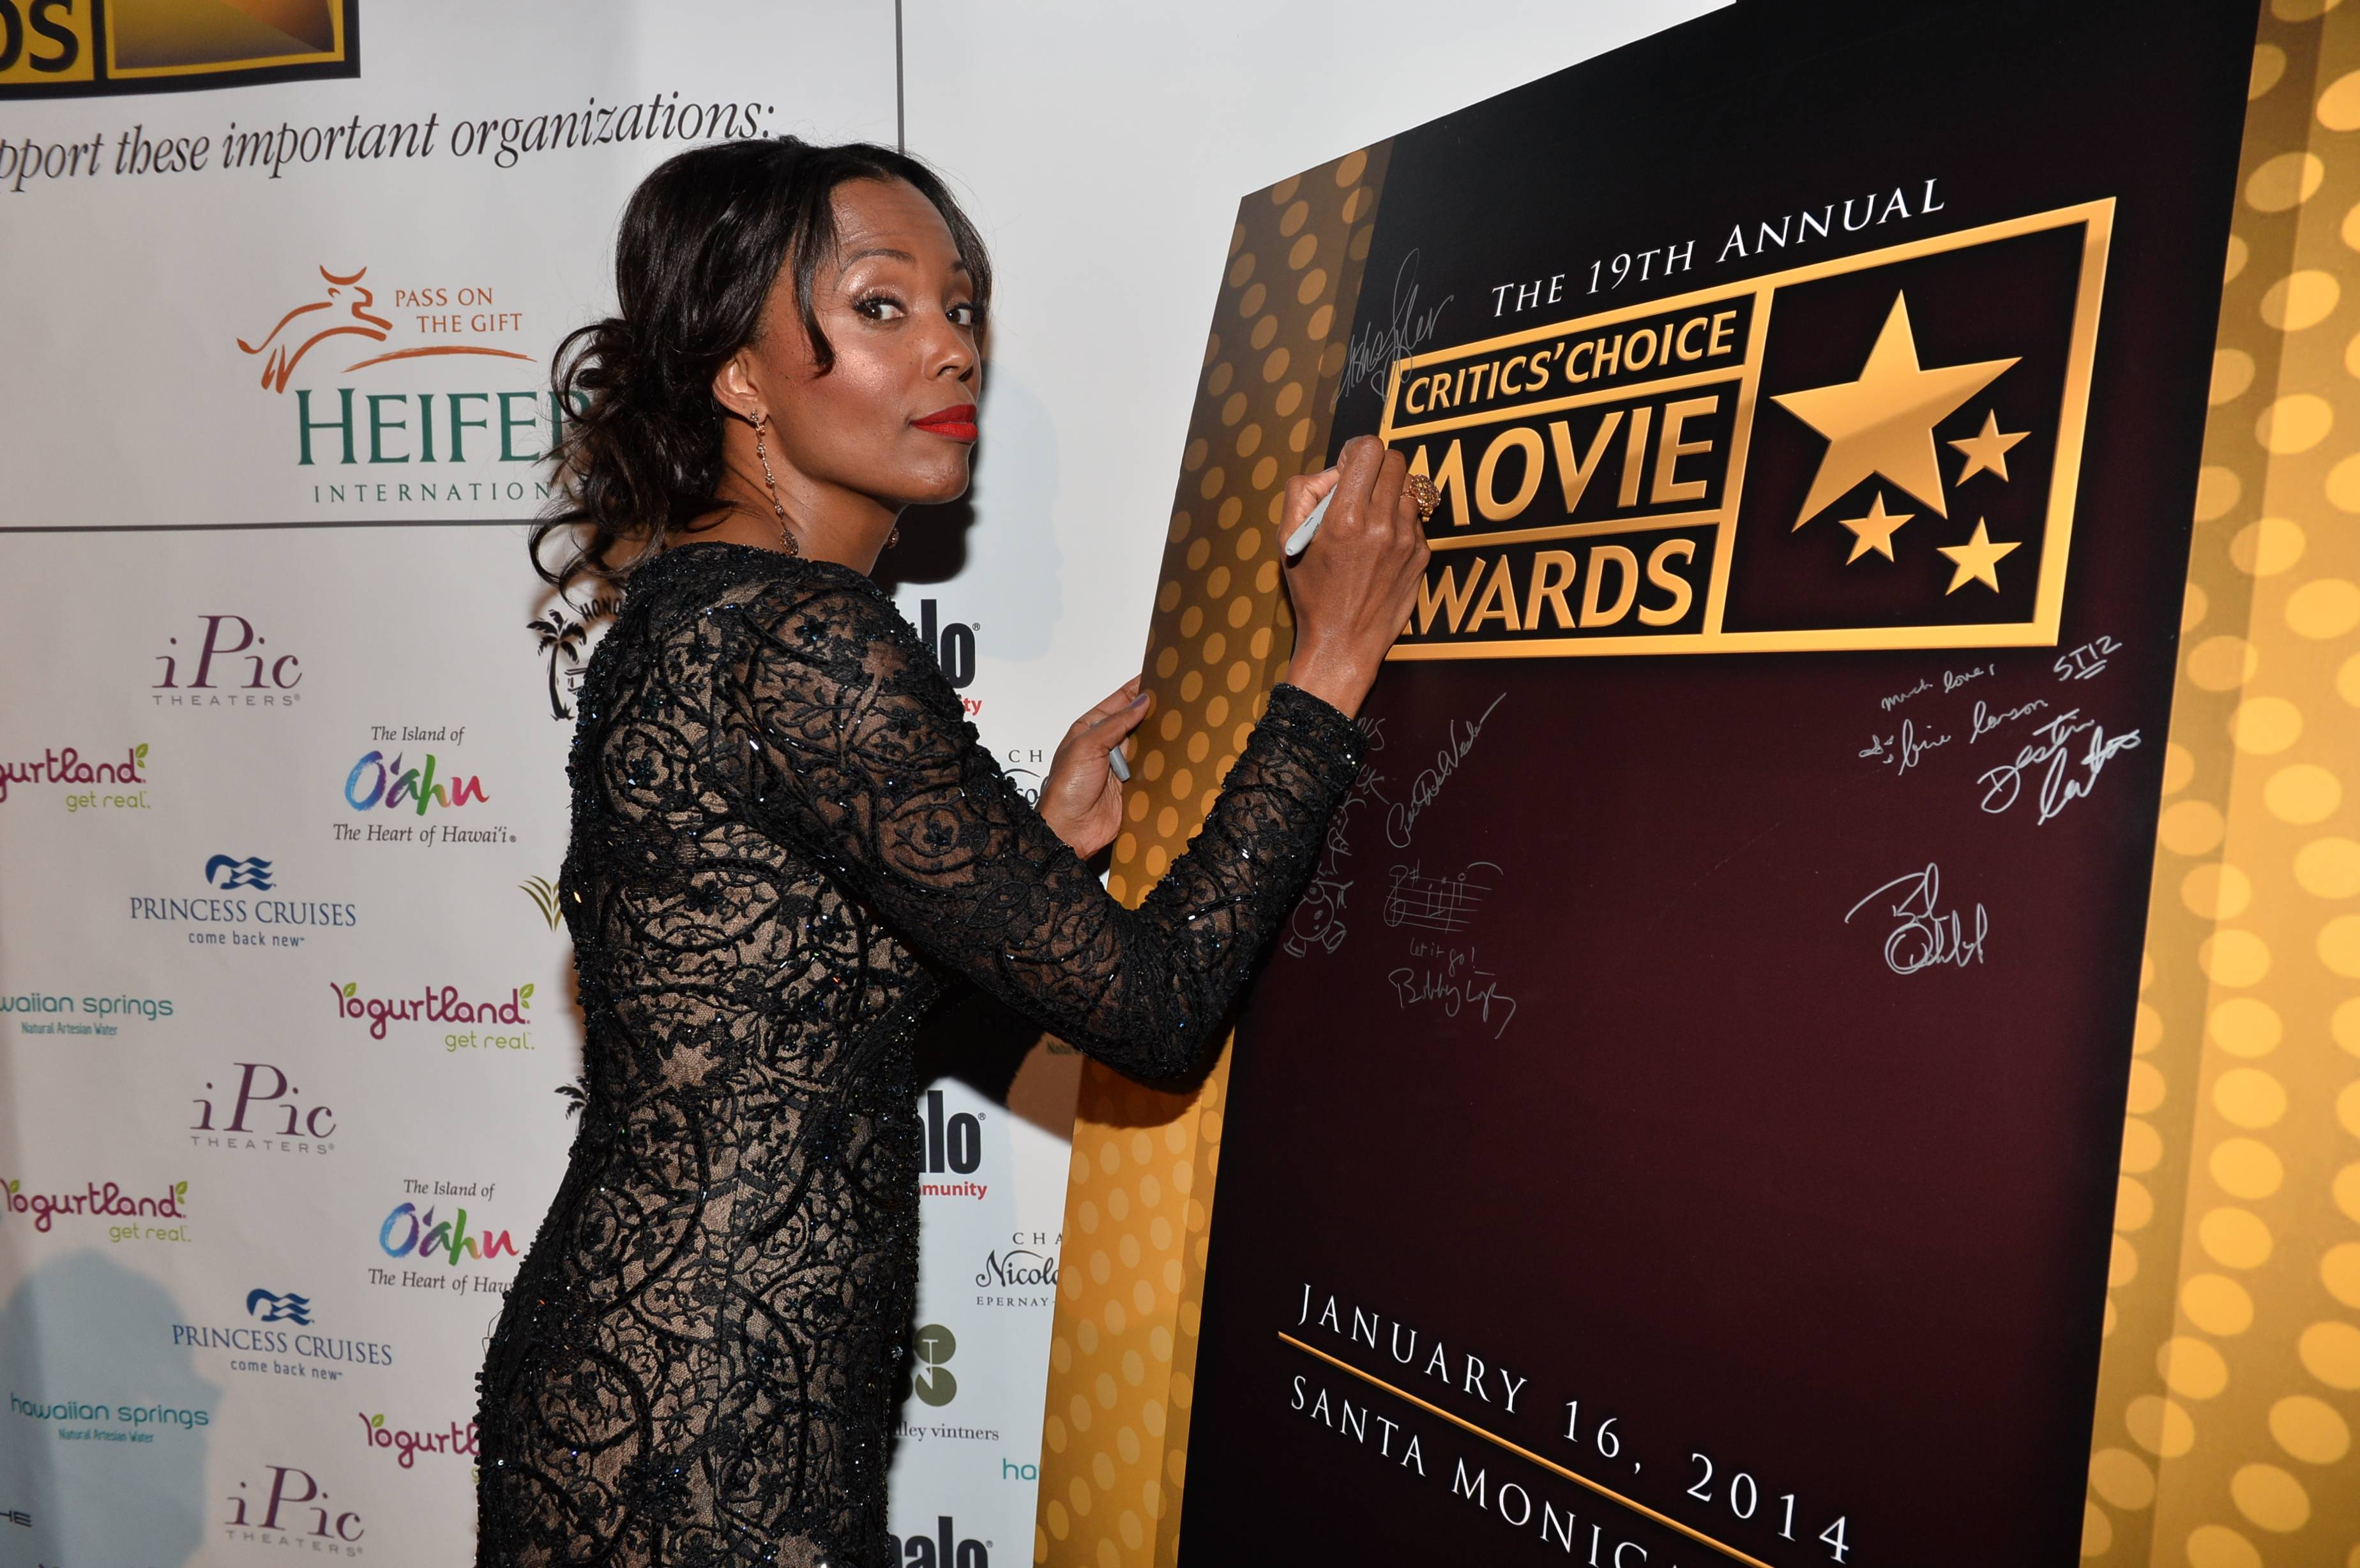 Critics' Choice Movie Awards 2014 VIP Reception